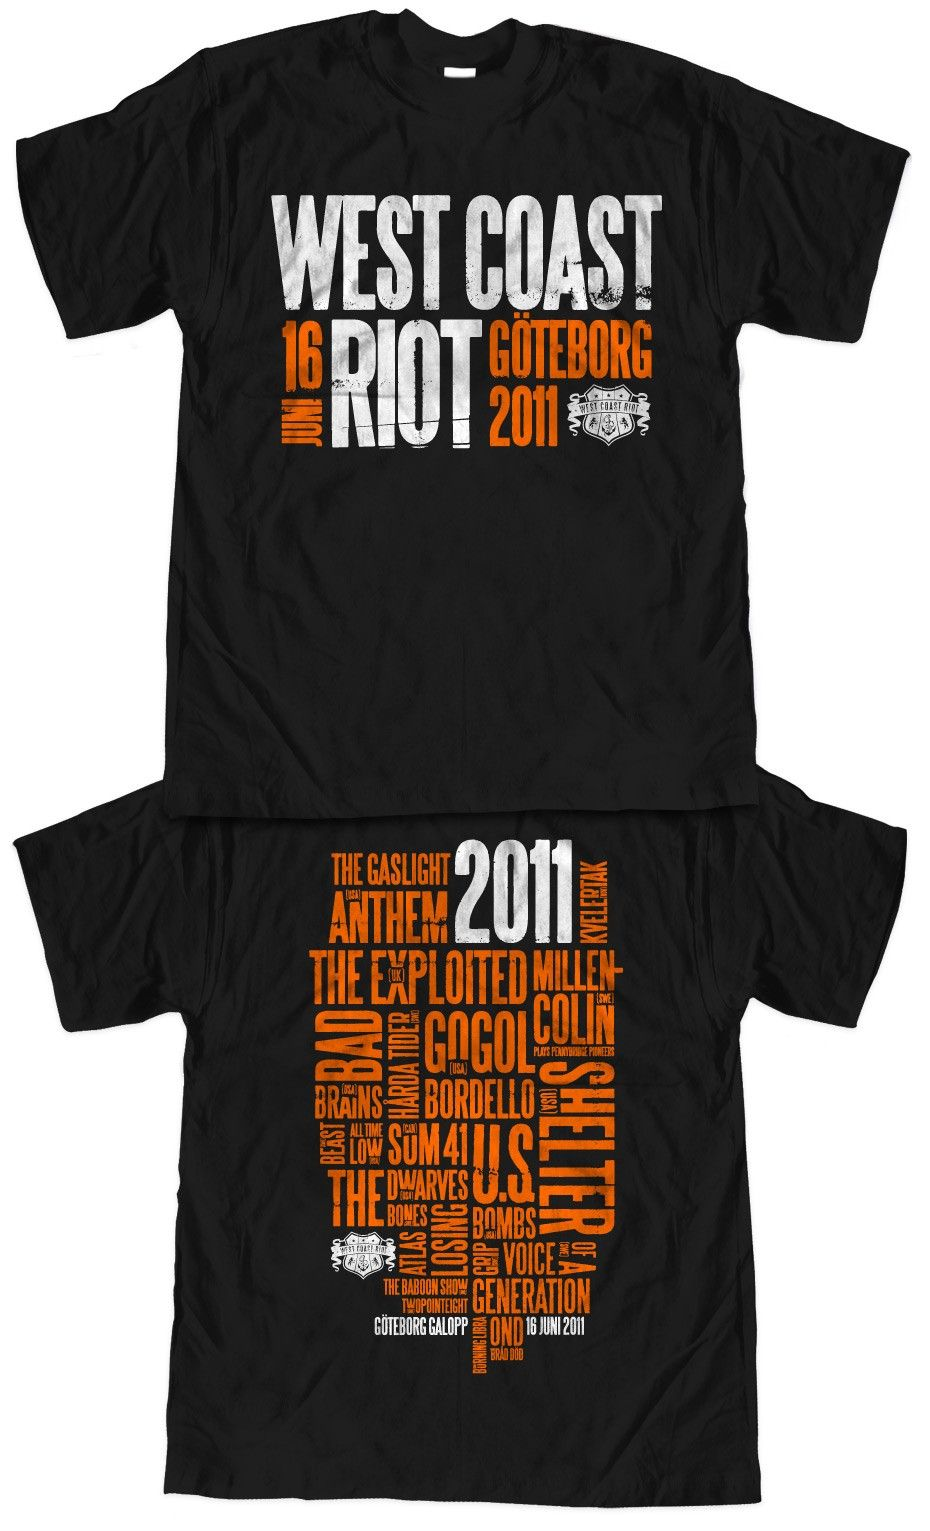 t shirt printing design ideas. | t shirt printing design ...